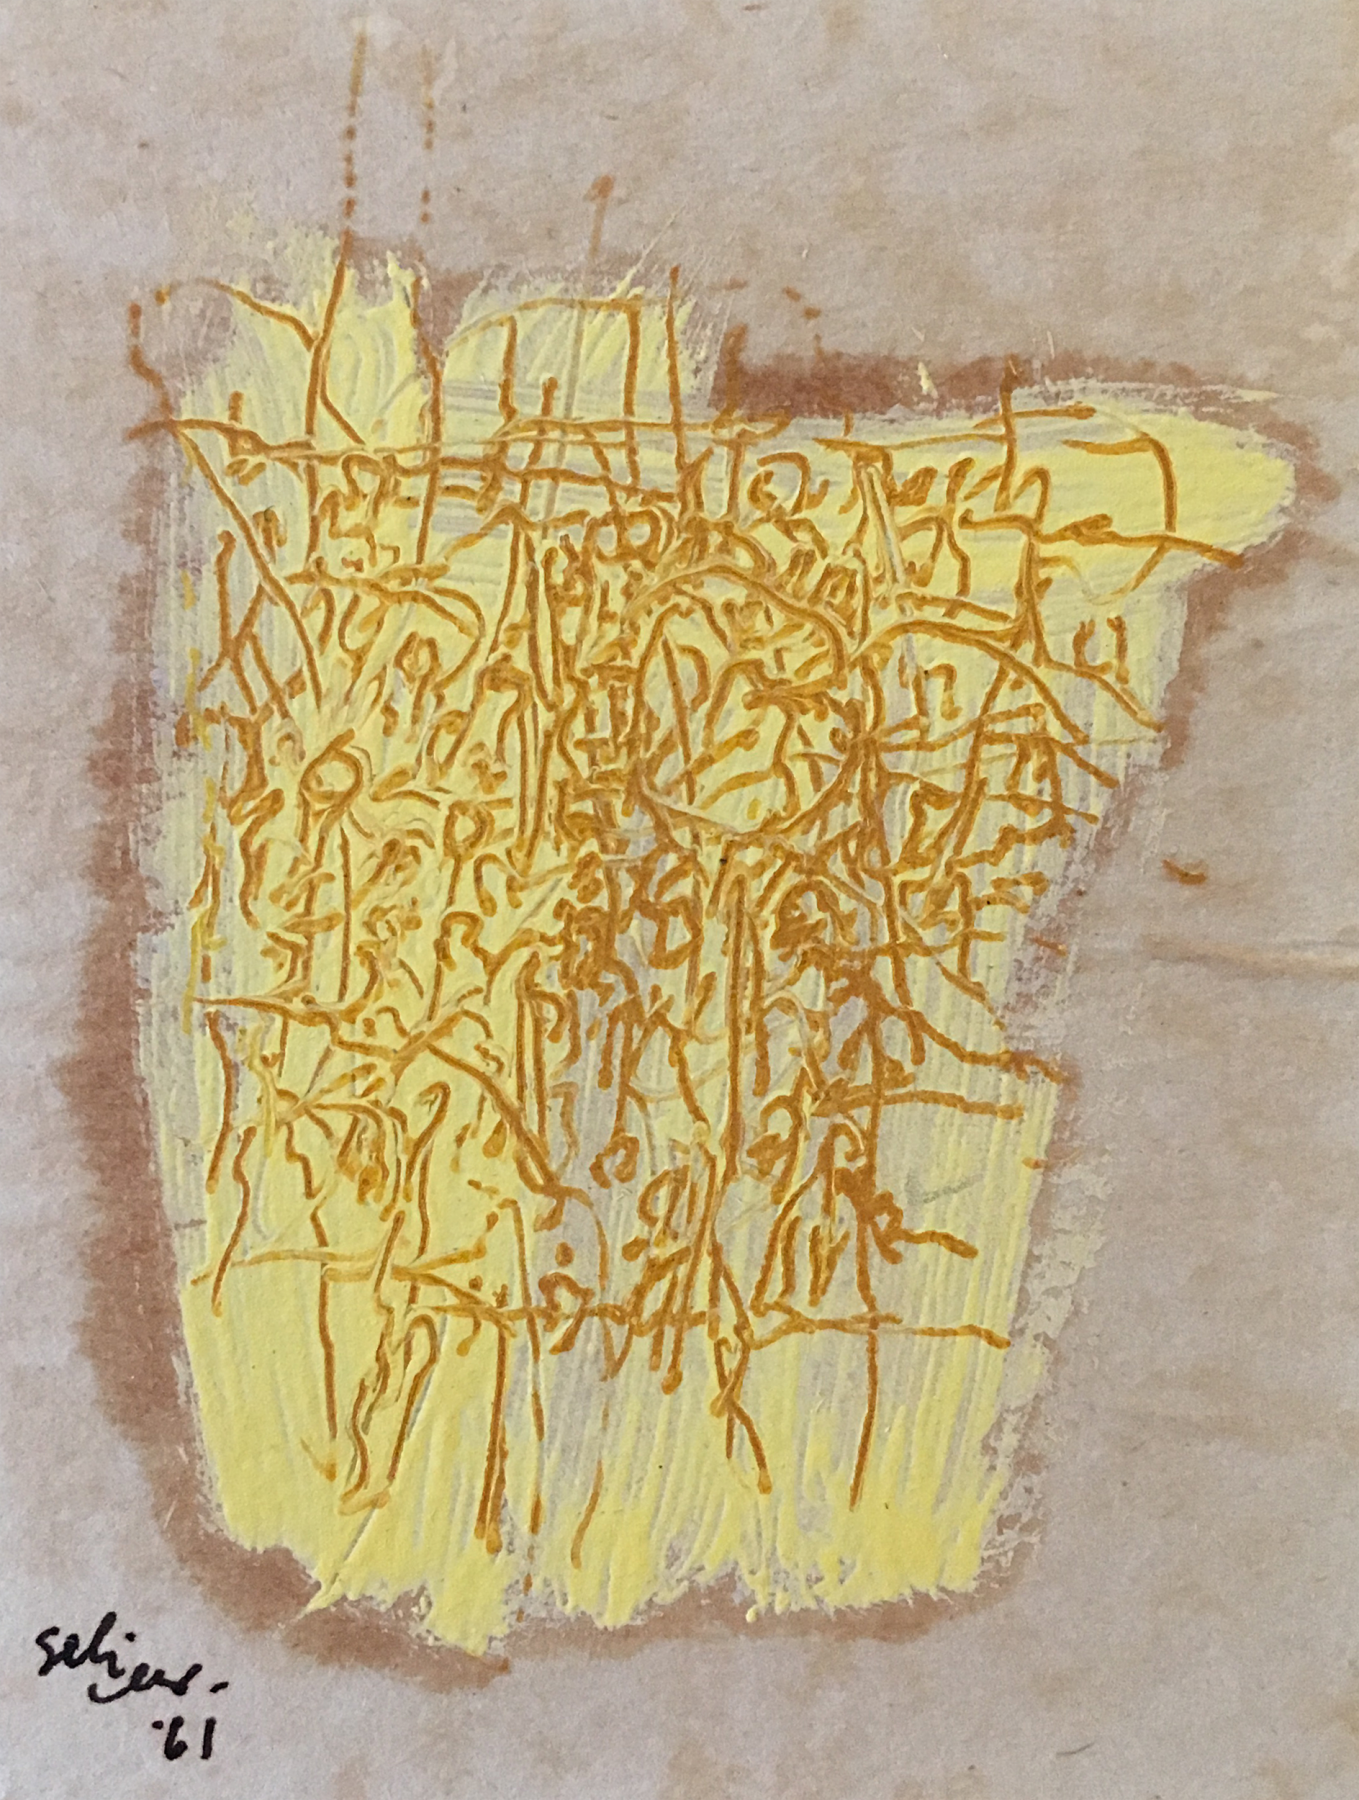 Charles Seliger | Caldwell Gallery Hudson